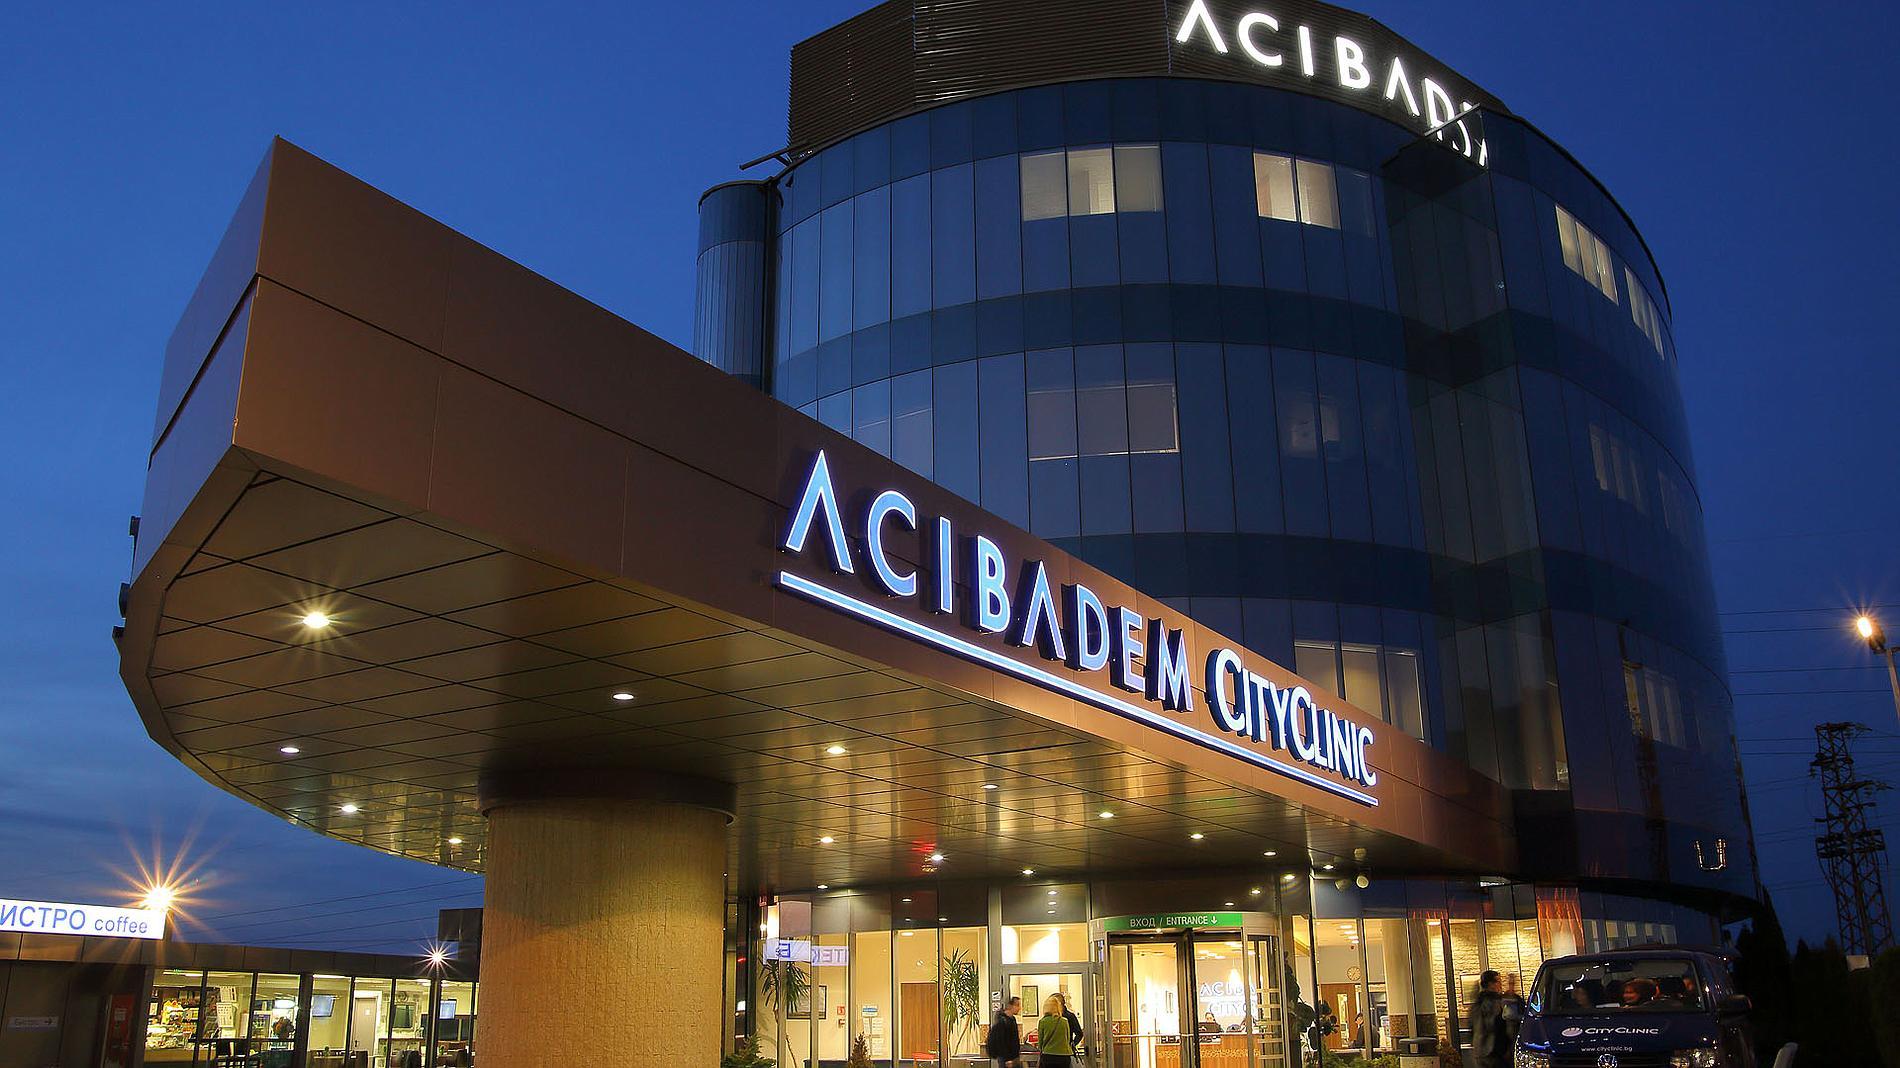 illuminated letters, exterior facade